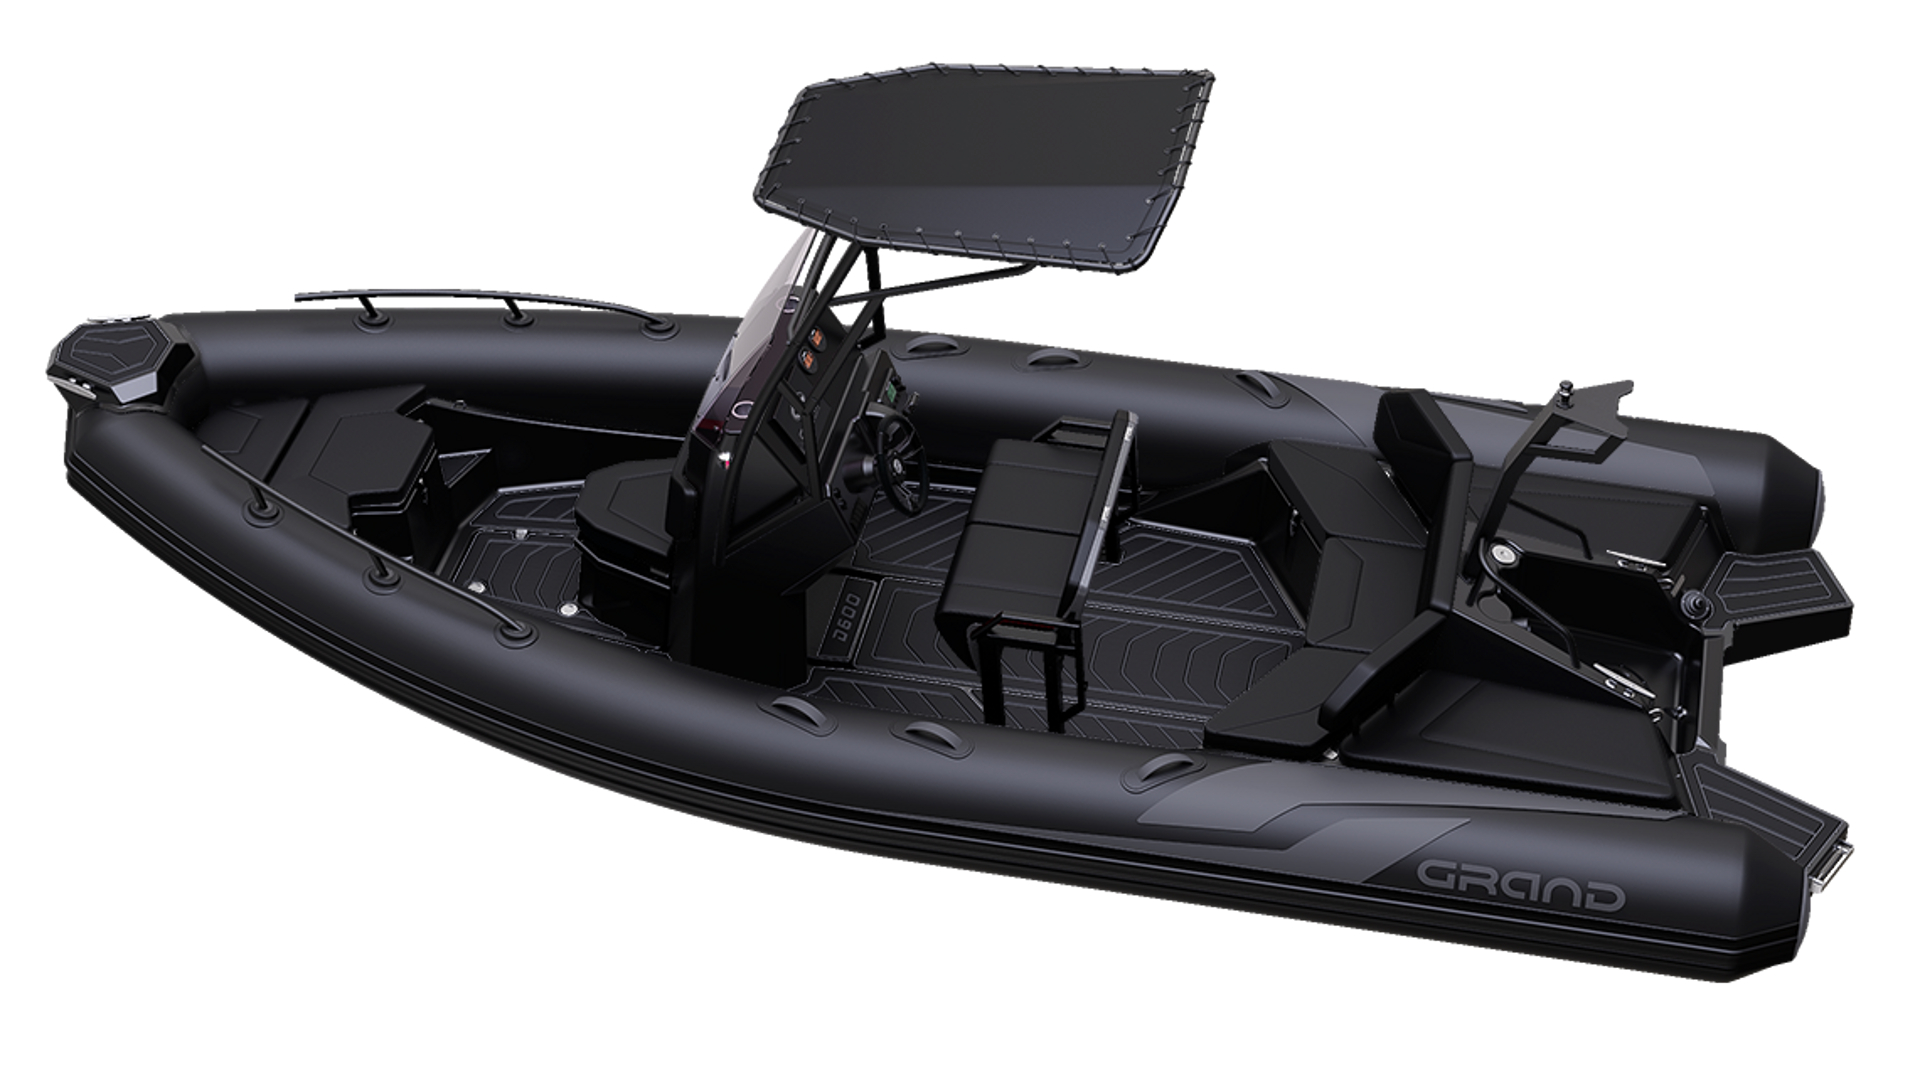 GRAND Drive Line, GRAND Drive, GRAND D600L, GRAND Drive D600 LUX, GRAND RIB, Pro RIB, надувная лодка GRAND Drive D600L, Rigid Inflatable Boats GRAND